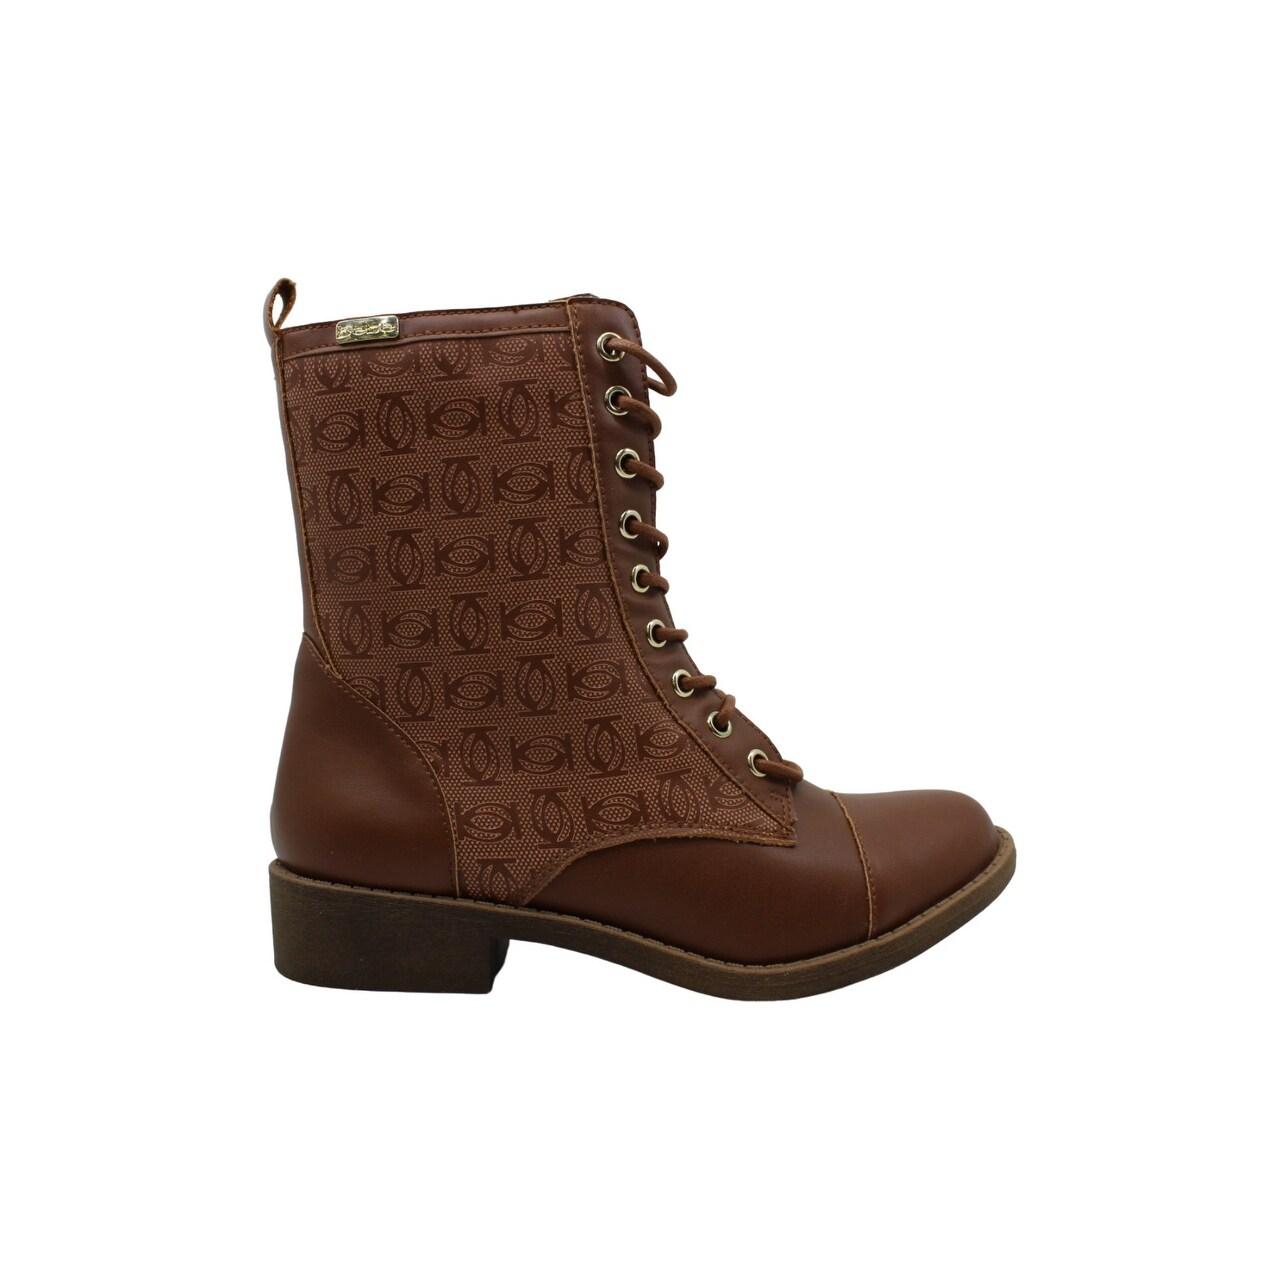 Bebe Womens Olsen Leather Closed Toe Mid-Calf Fashion Boots